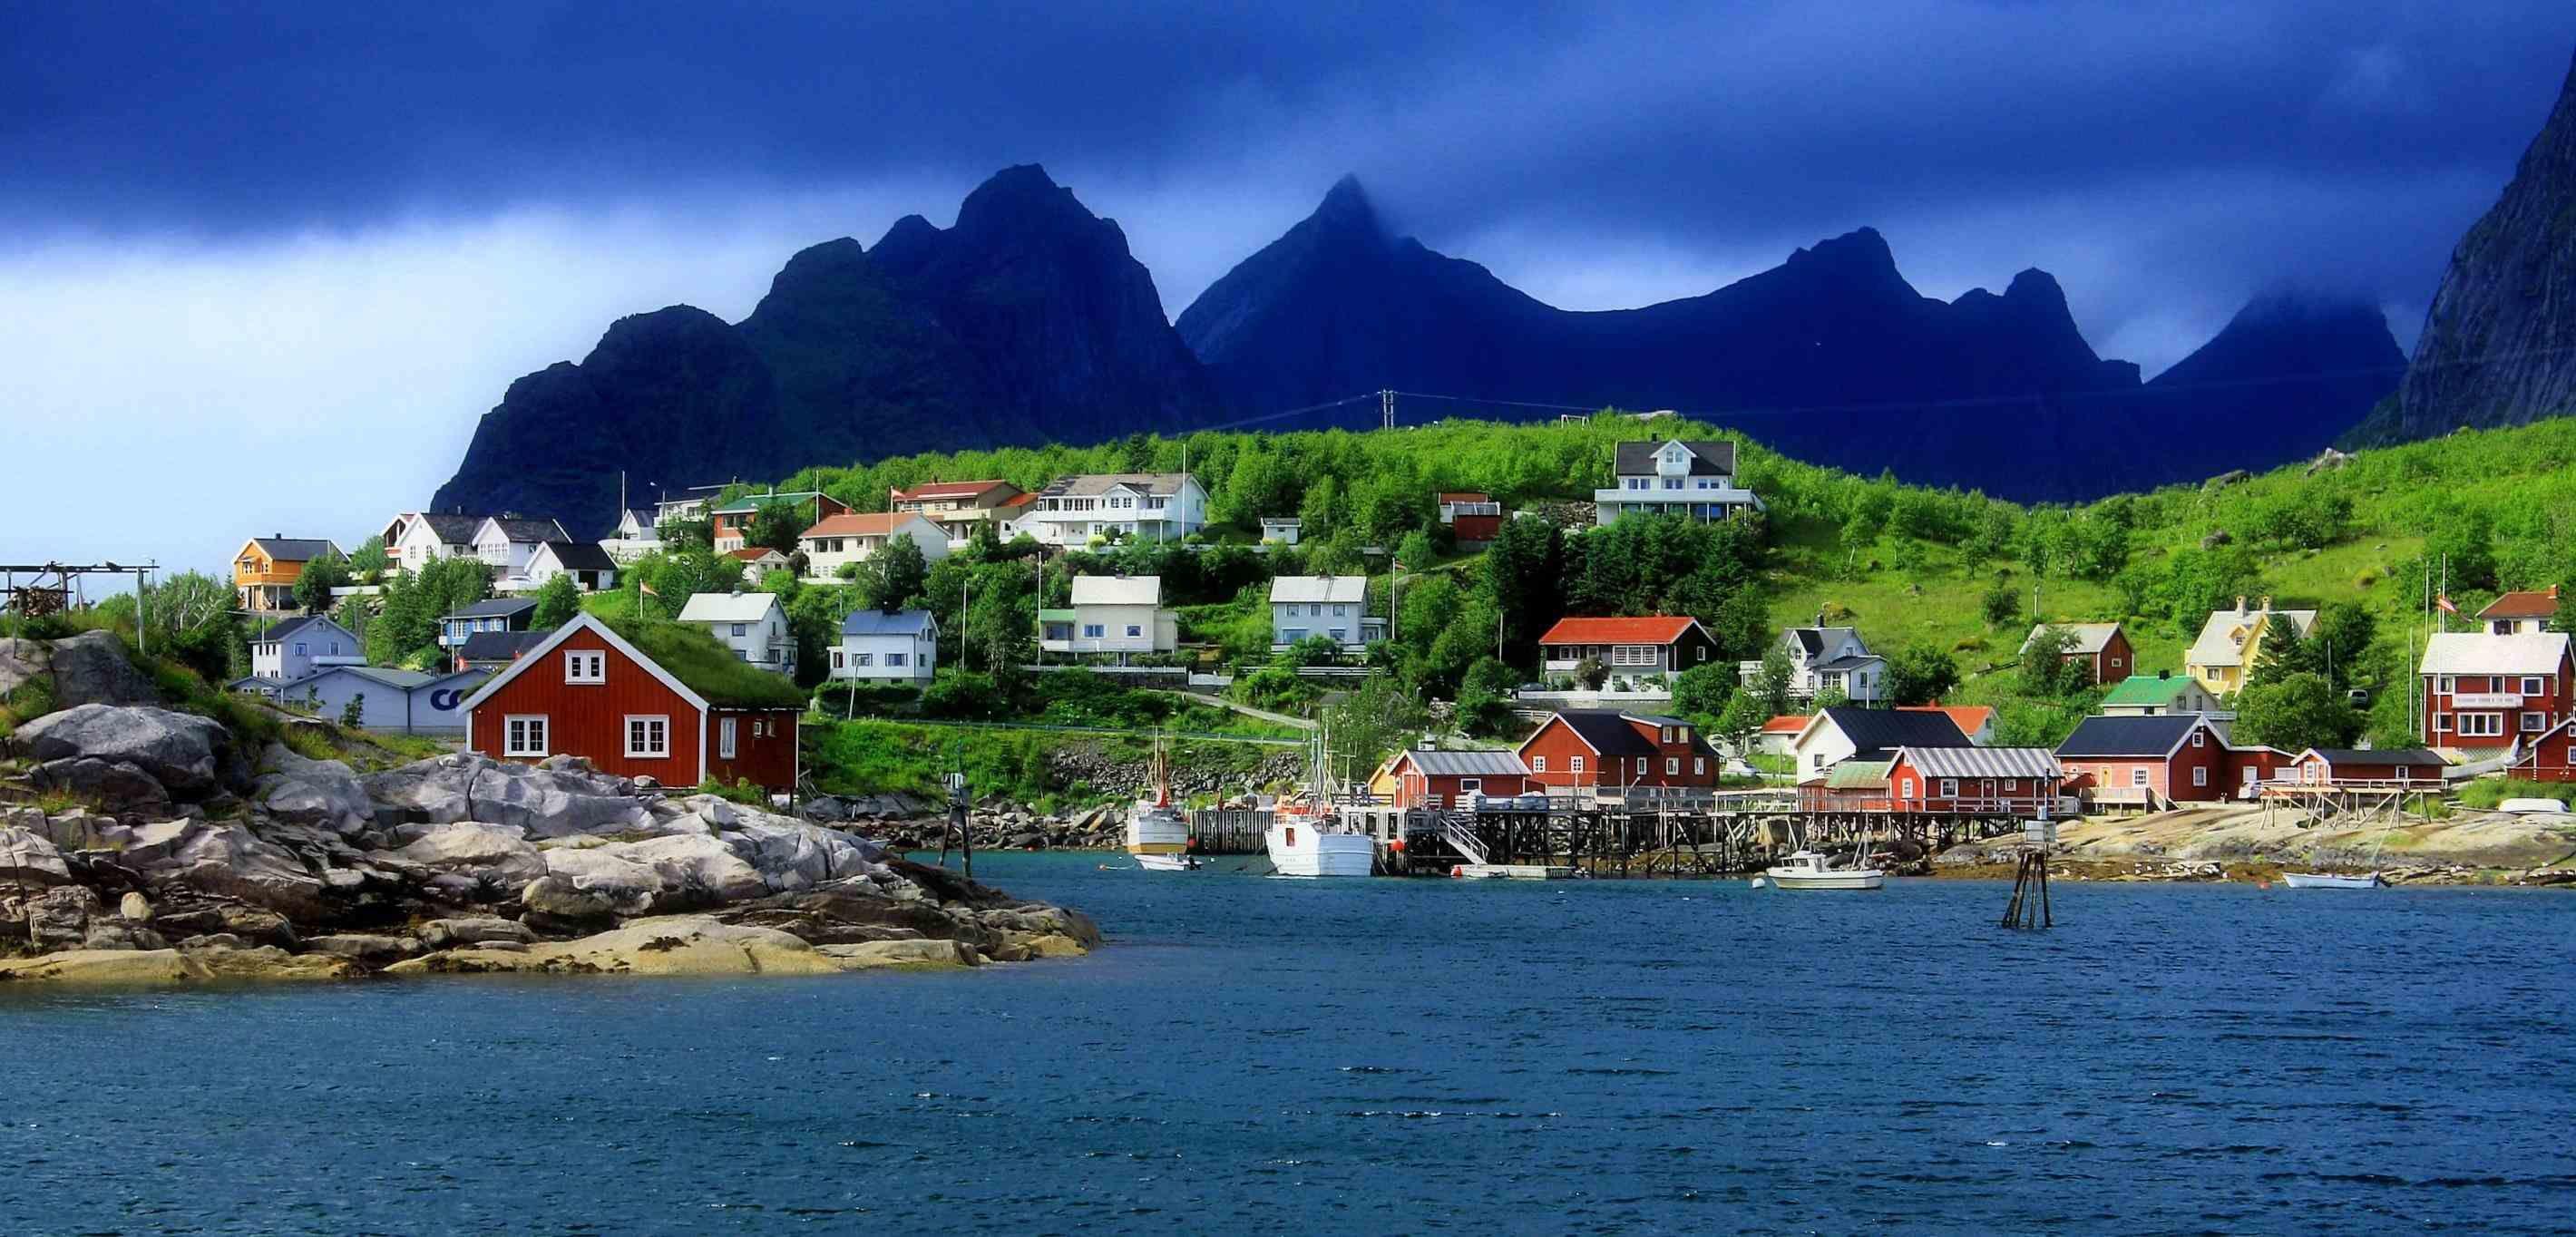 Attractions And Restaurants Making It Your Best Resource Book Reine Norway Northern Lights Rorbuer Lofoten Islands O Norway Travel Tours Lofoten Islands Norway